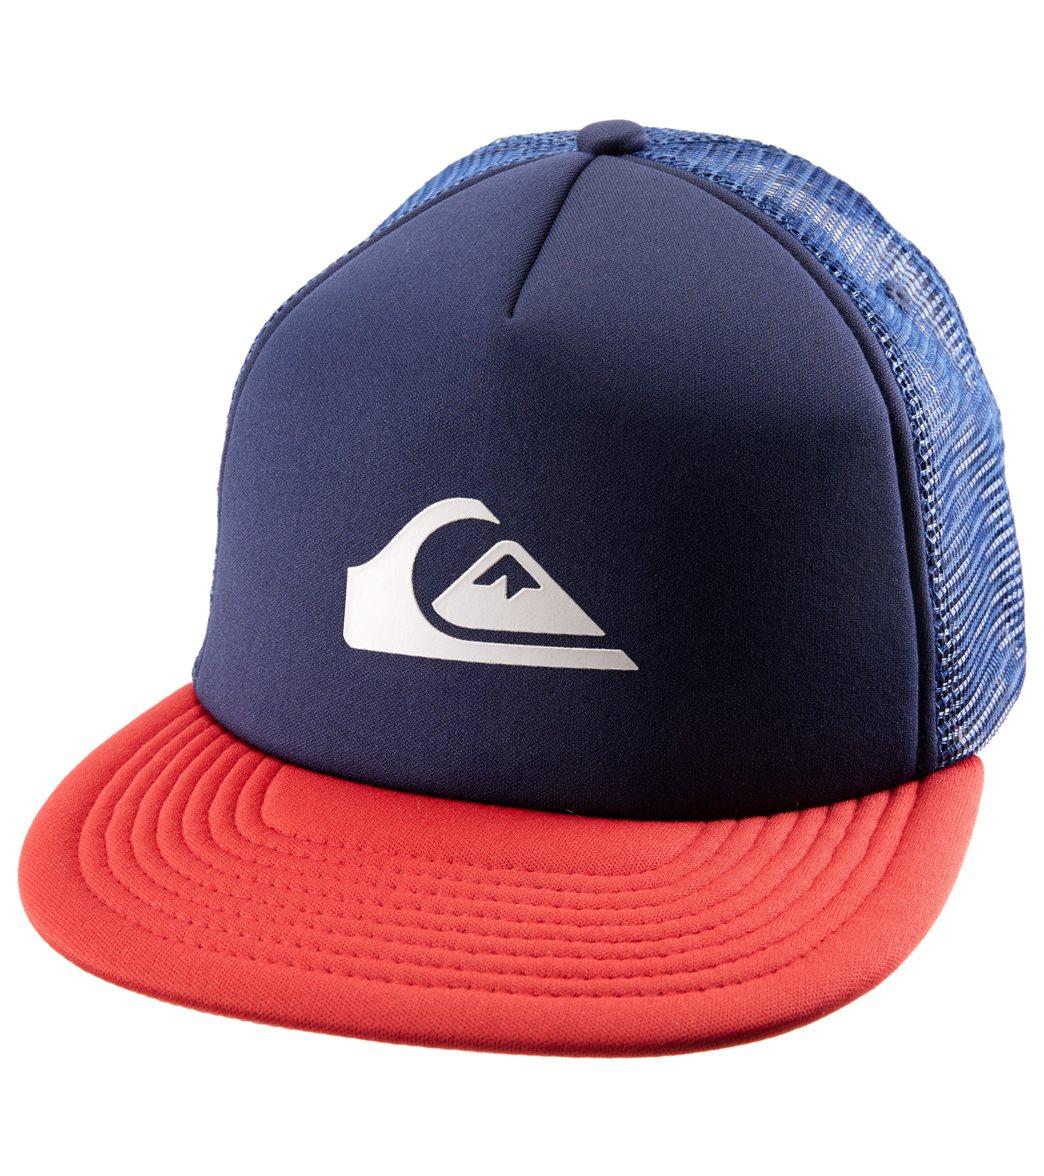 e0330c93b950d Quiksilver Men s Snap Addict Hat at SwimOutlet.com